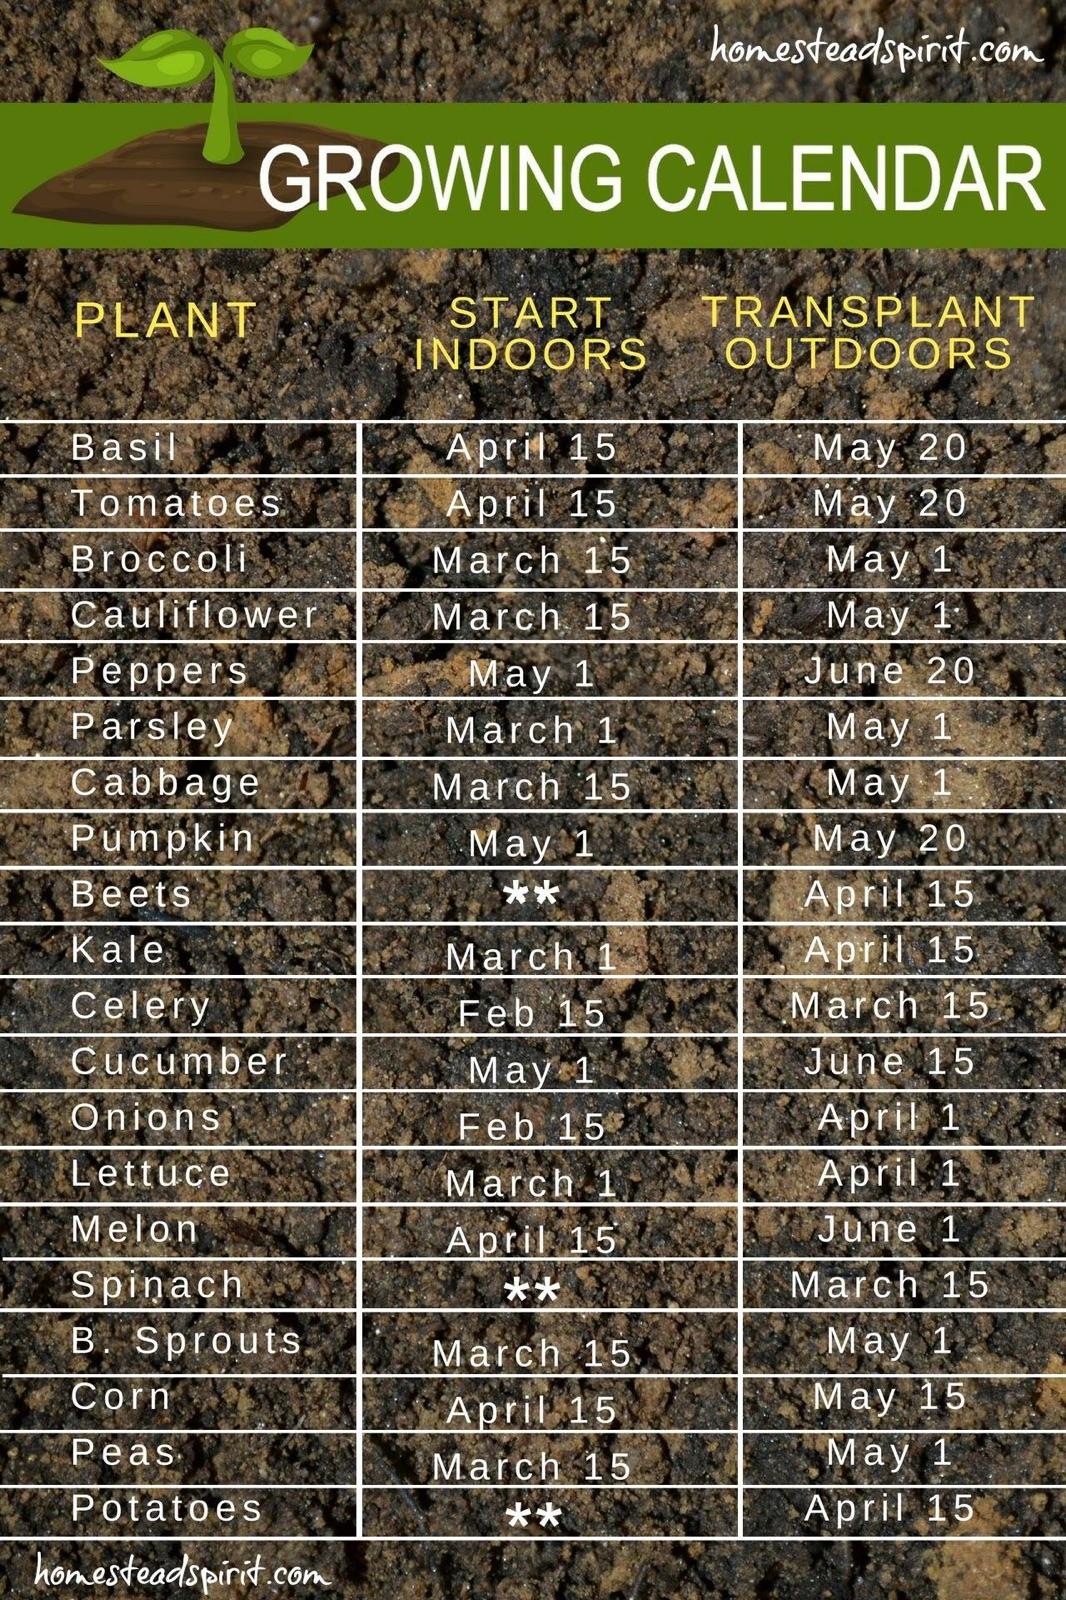 Garden Growing Calendar